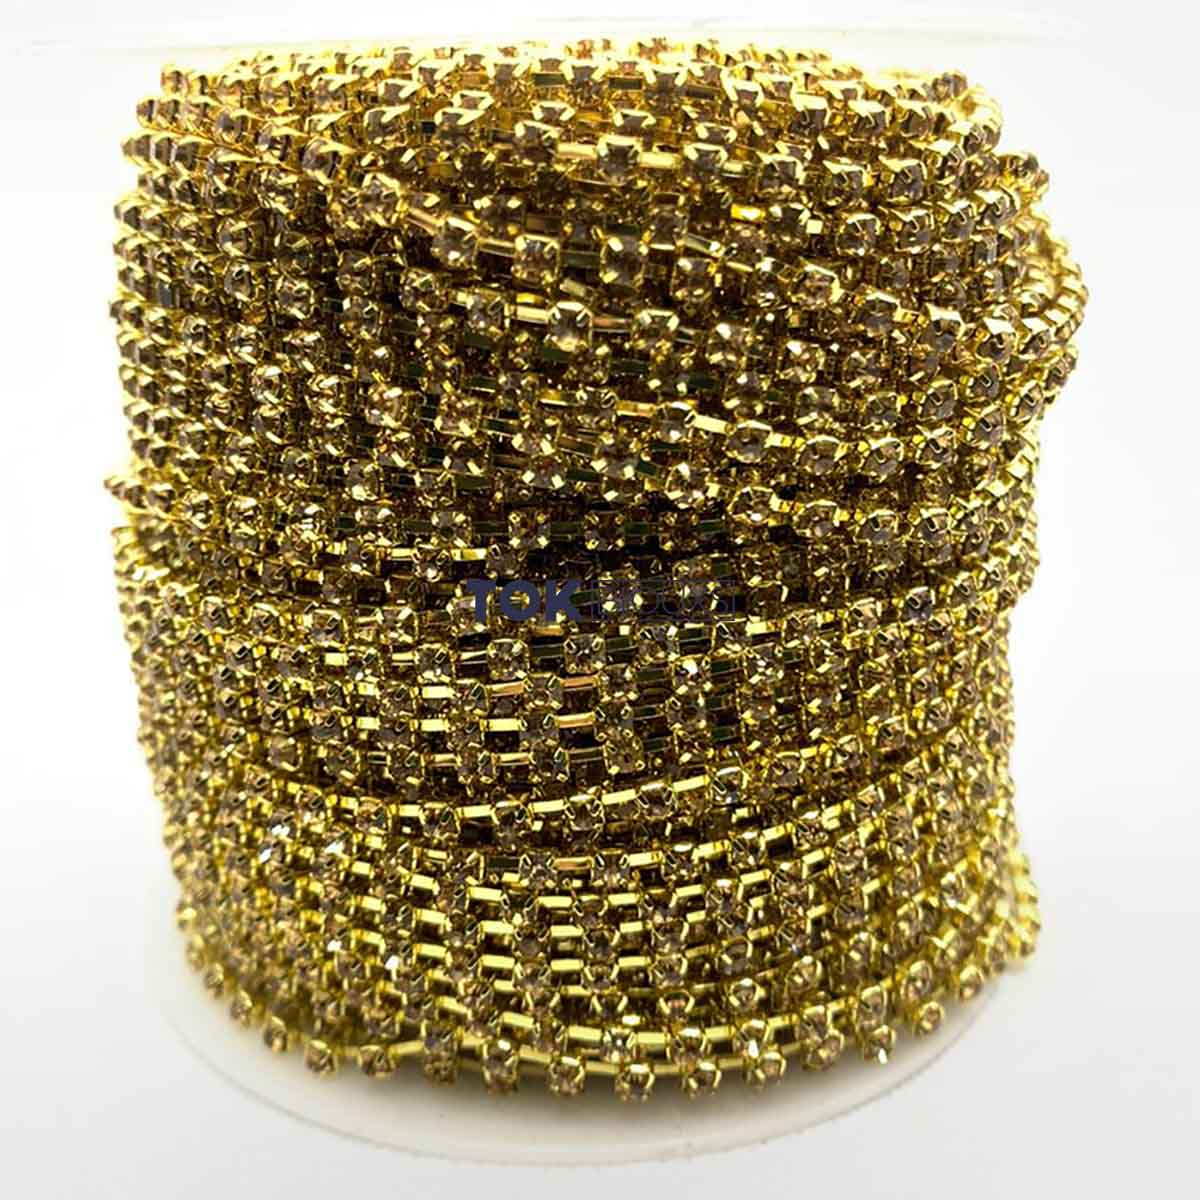 Atacado -  Corrente De Strass SS12 - Corrente Dourado C/ Cristal Mel - 50m